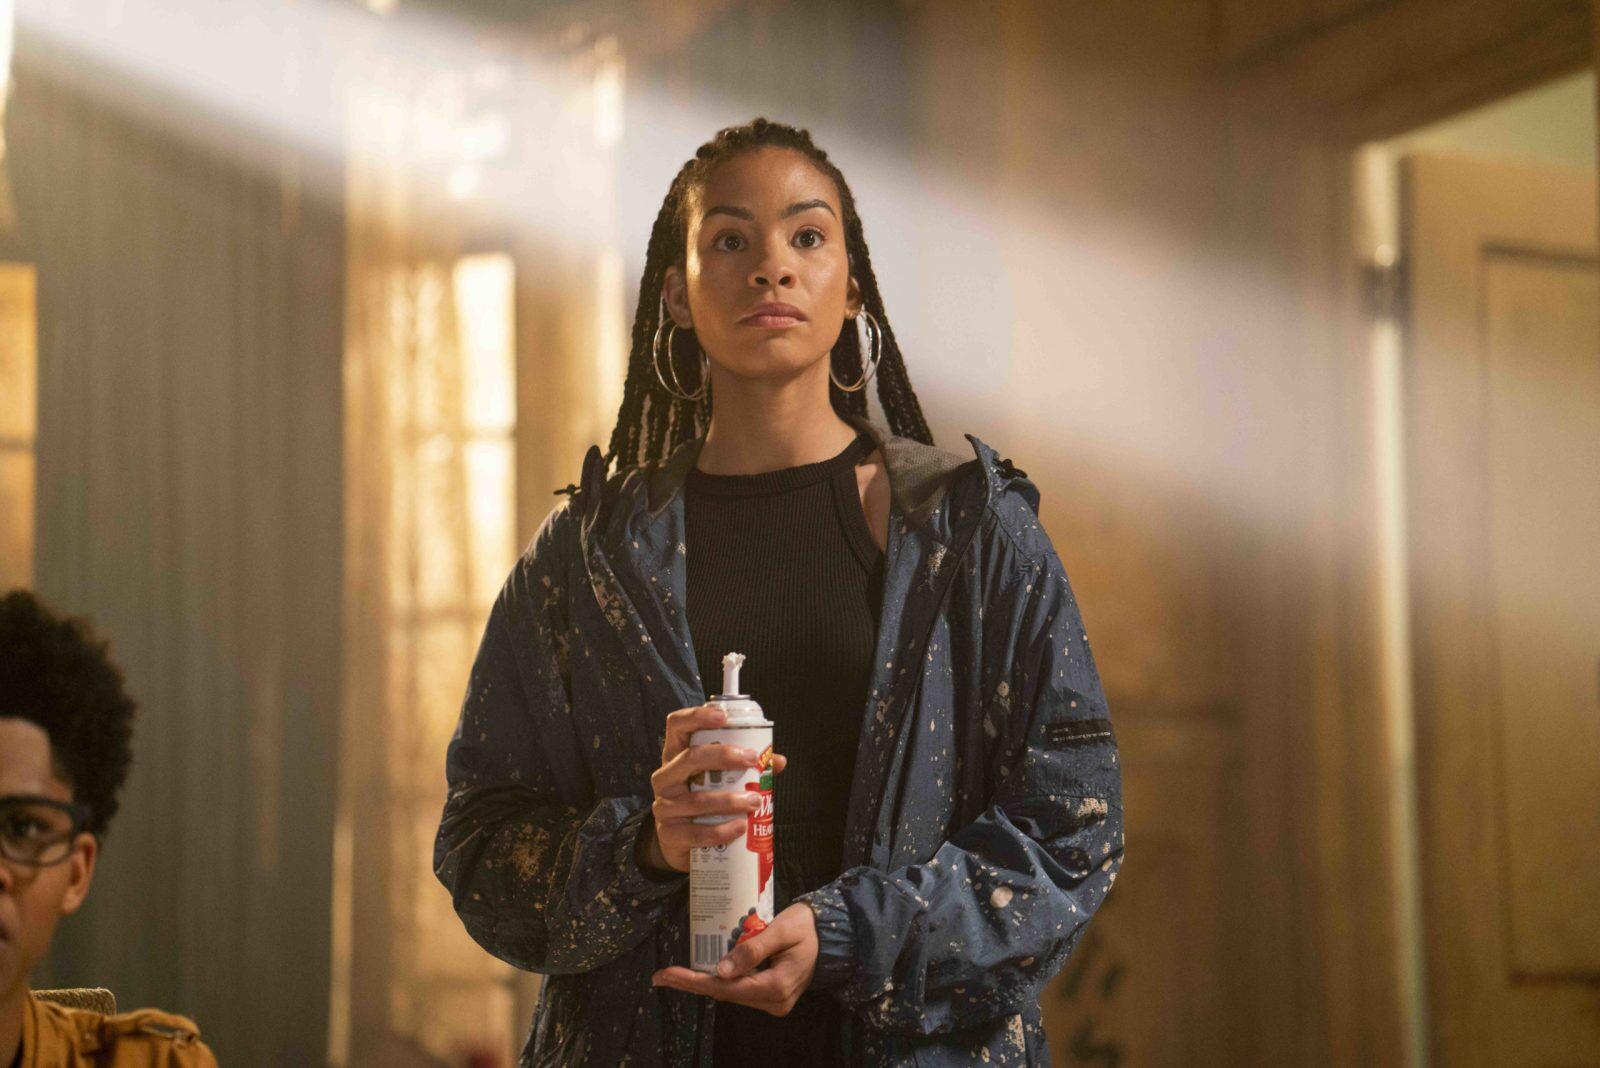 Marvel's Runaways season 3: Clarissa Thibeaux talks playing Xavin